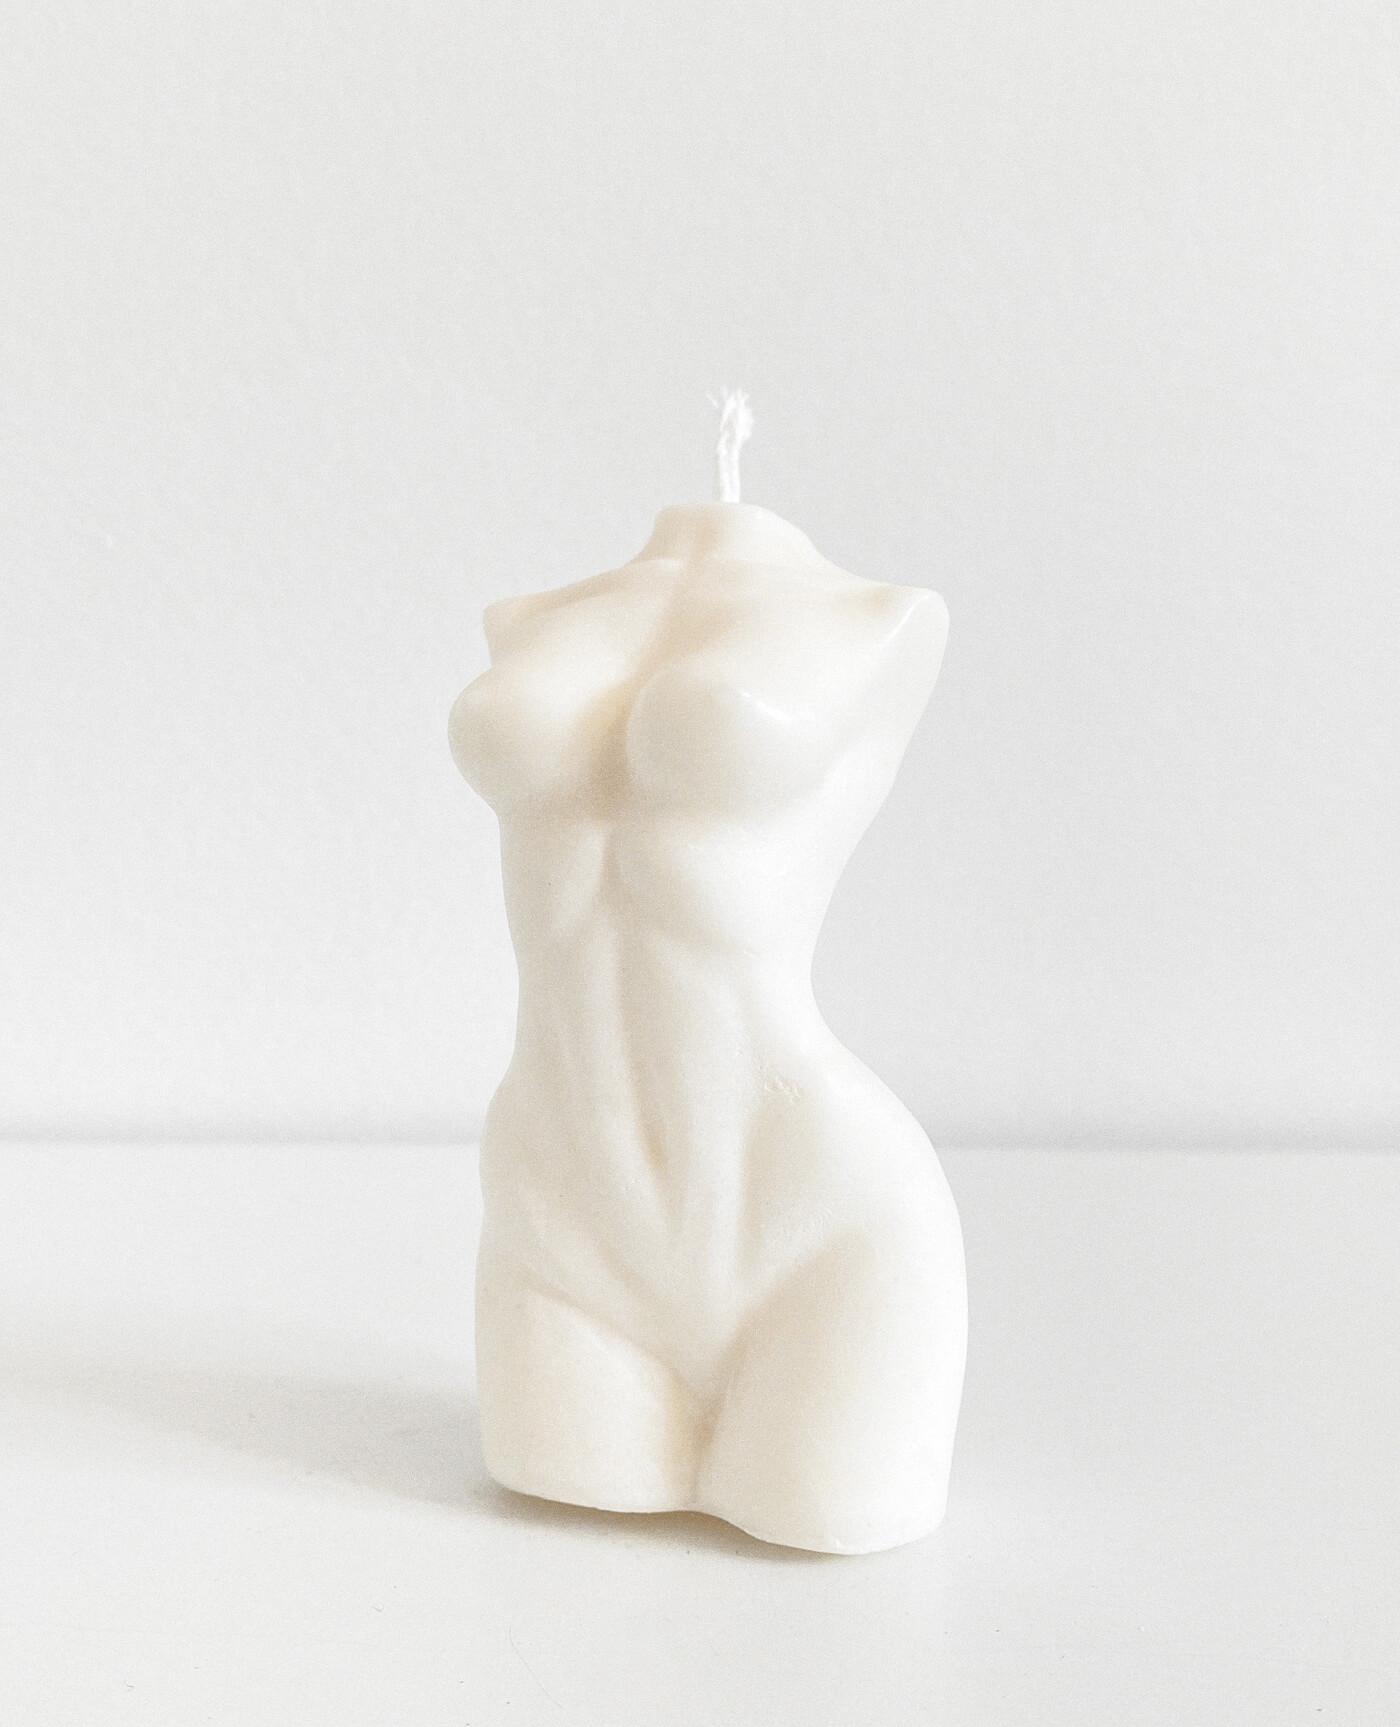 Prose-bougie-parfumée-sculpture-vegan-la-petite-muse-80g-2